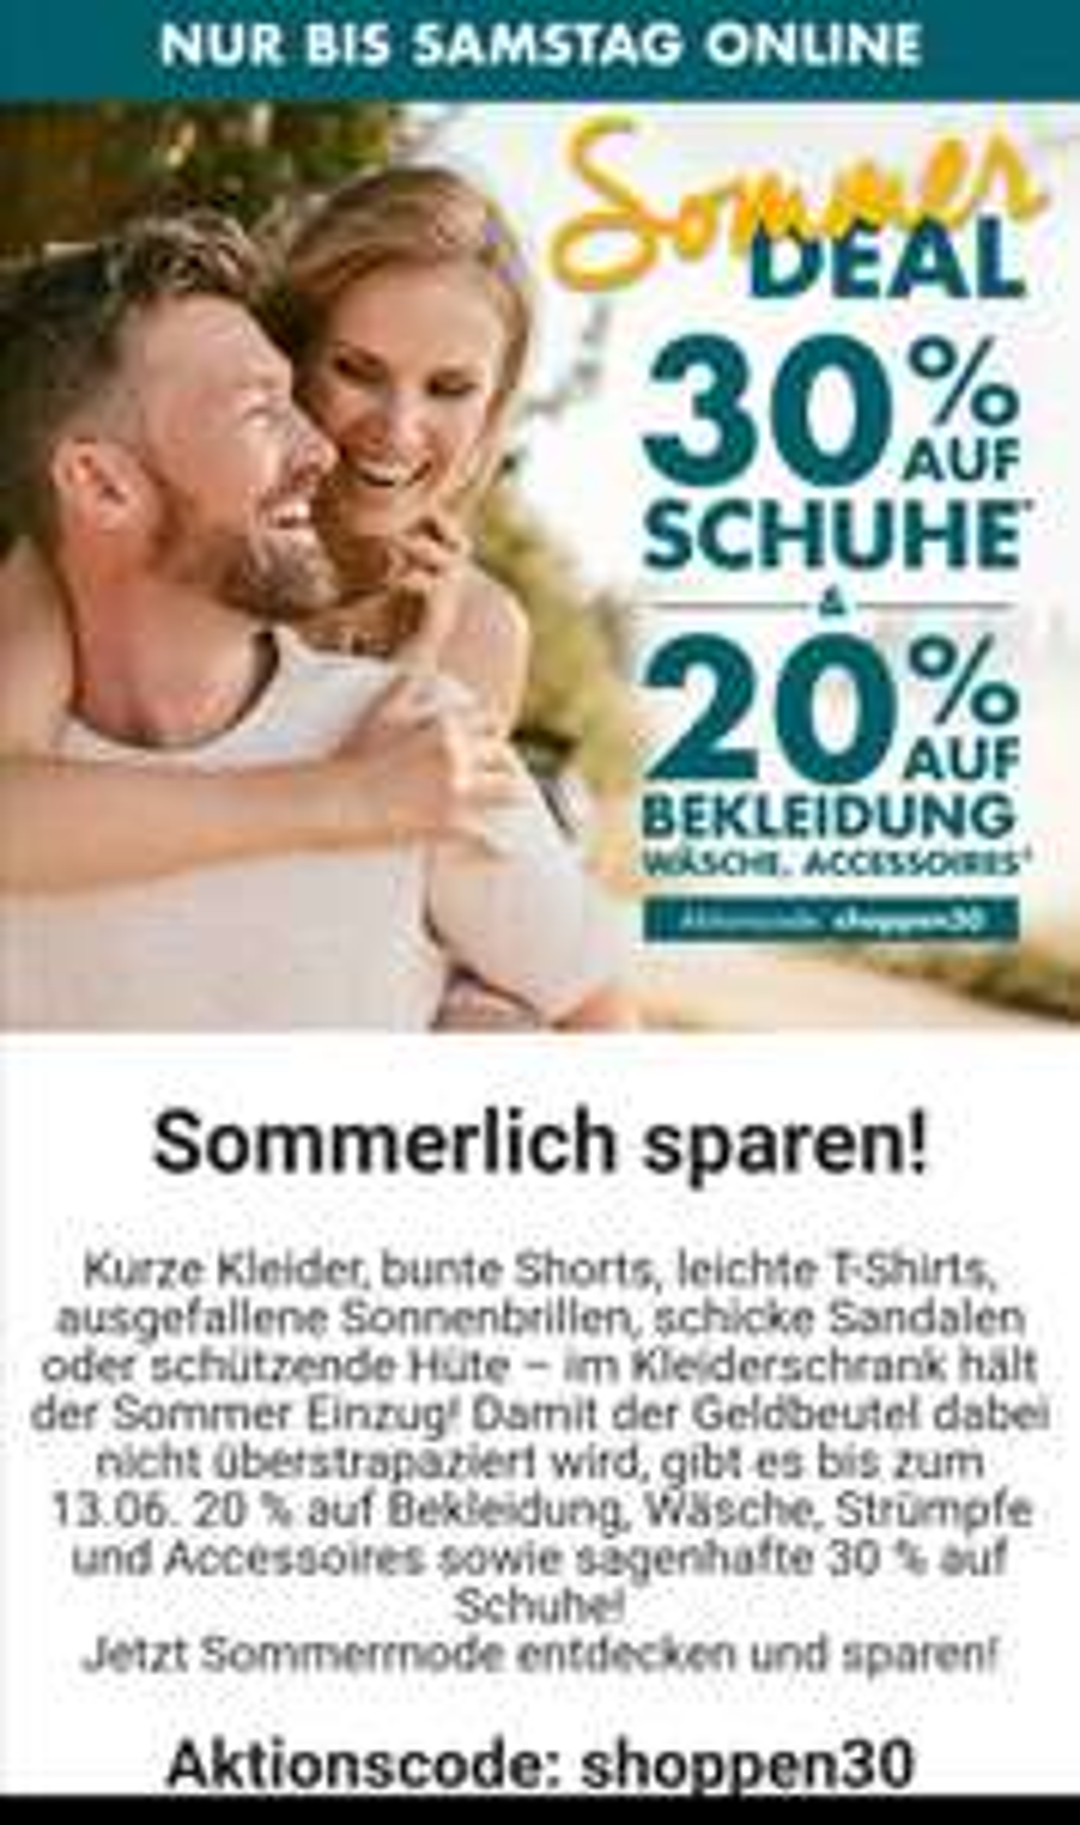 20 bzw 30% bei Galeria Karstadt Kaufhof